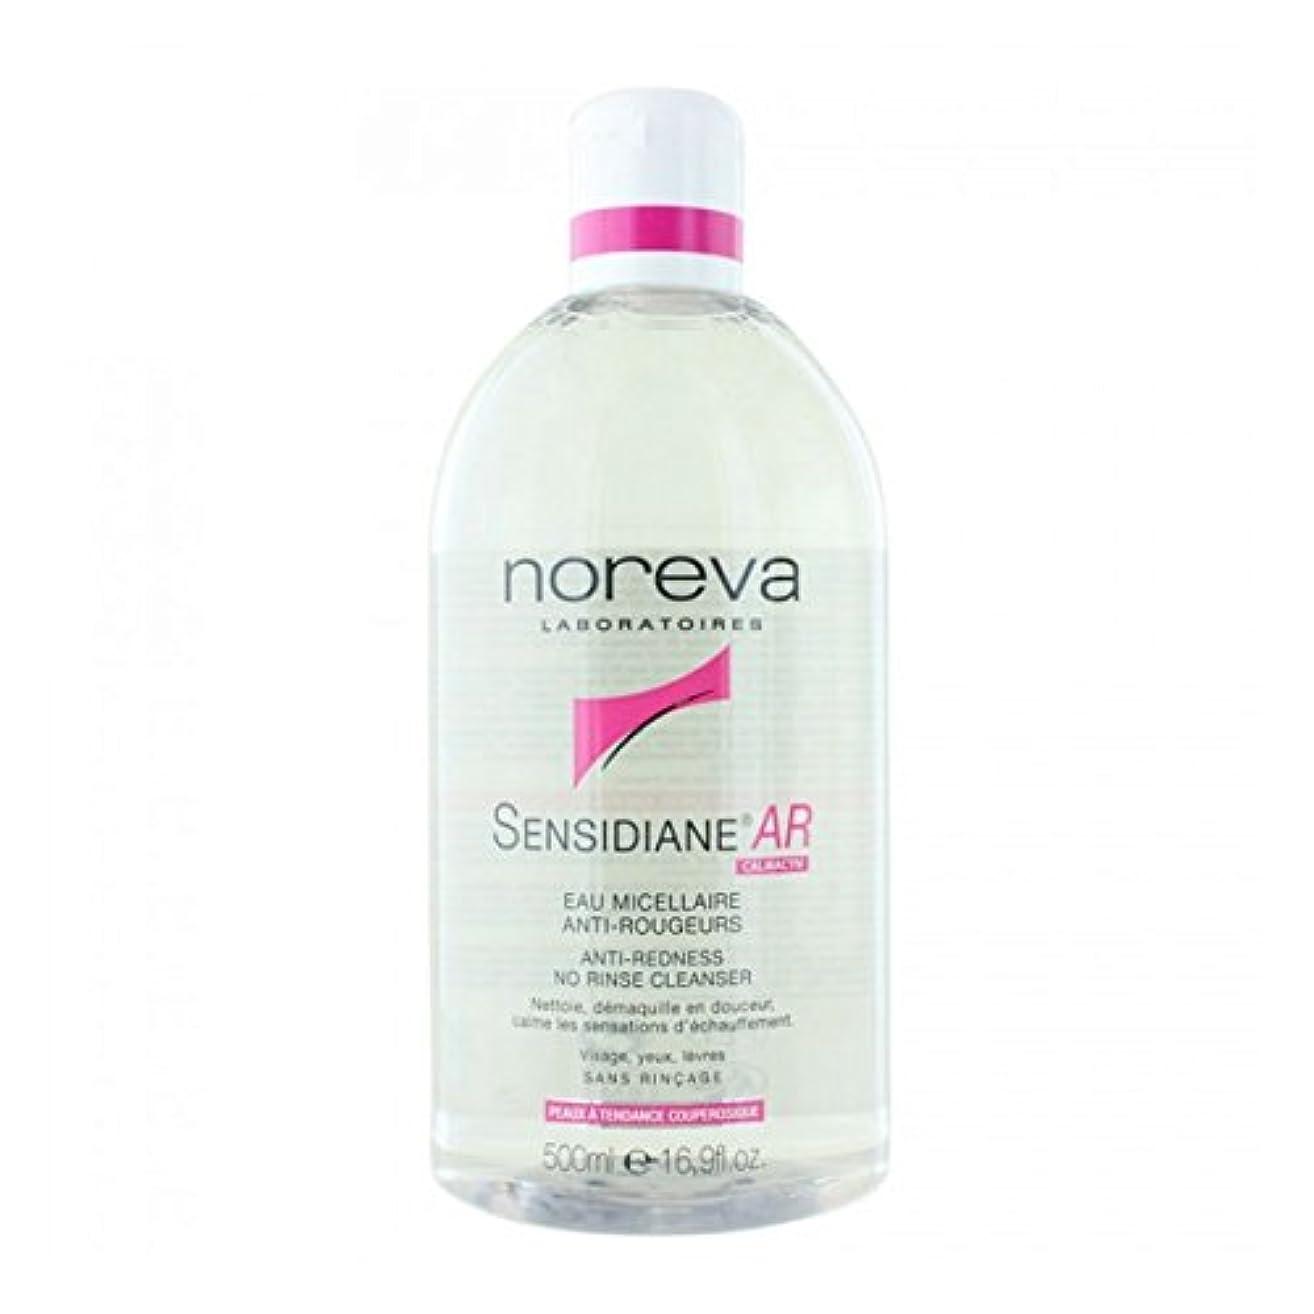 Noreva Sensidiane Ar Anti-redness No Rinse Cleanser 500ml [並行輸入品]